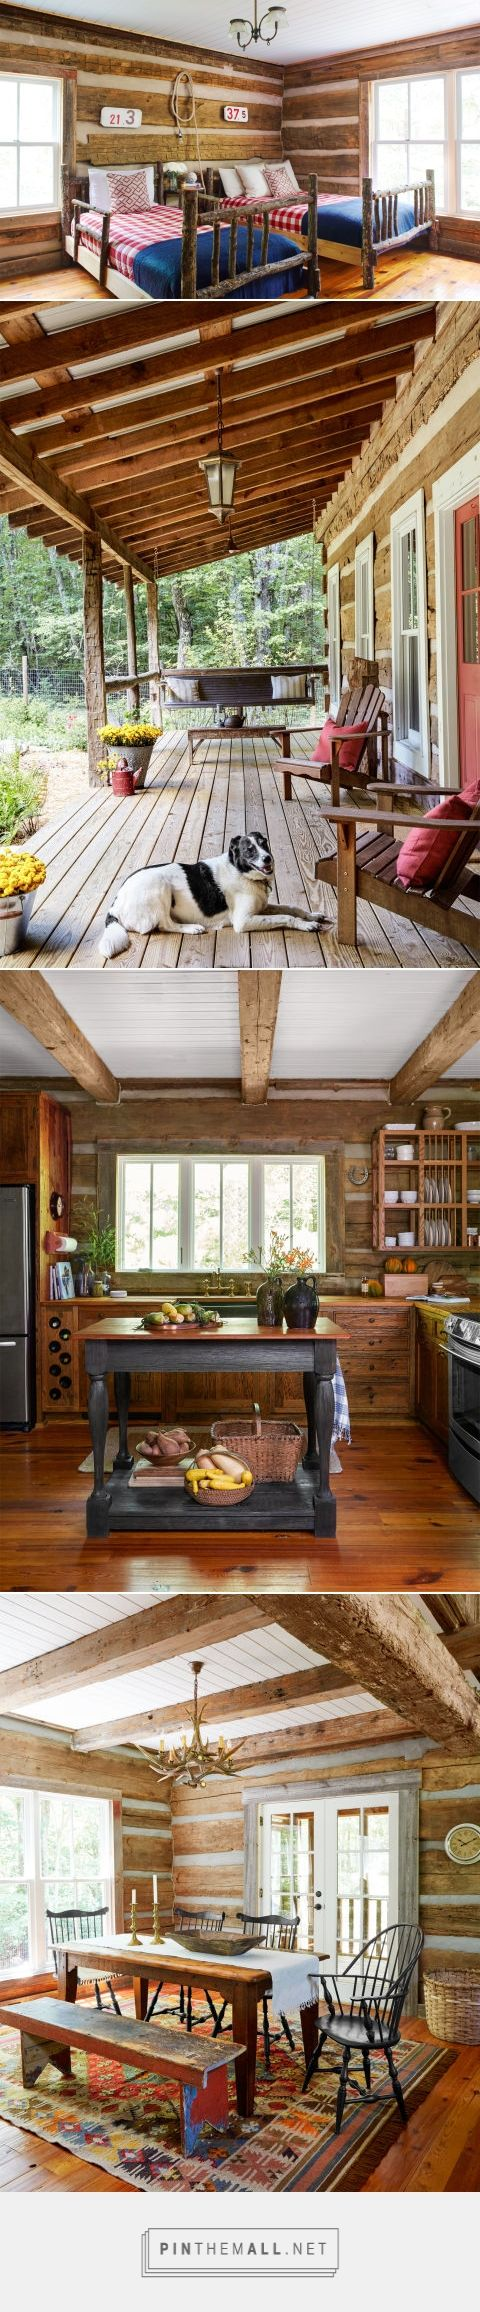 Rustic cabin furniture - Tennessee Log Cabin